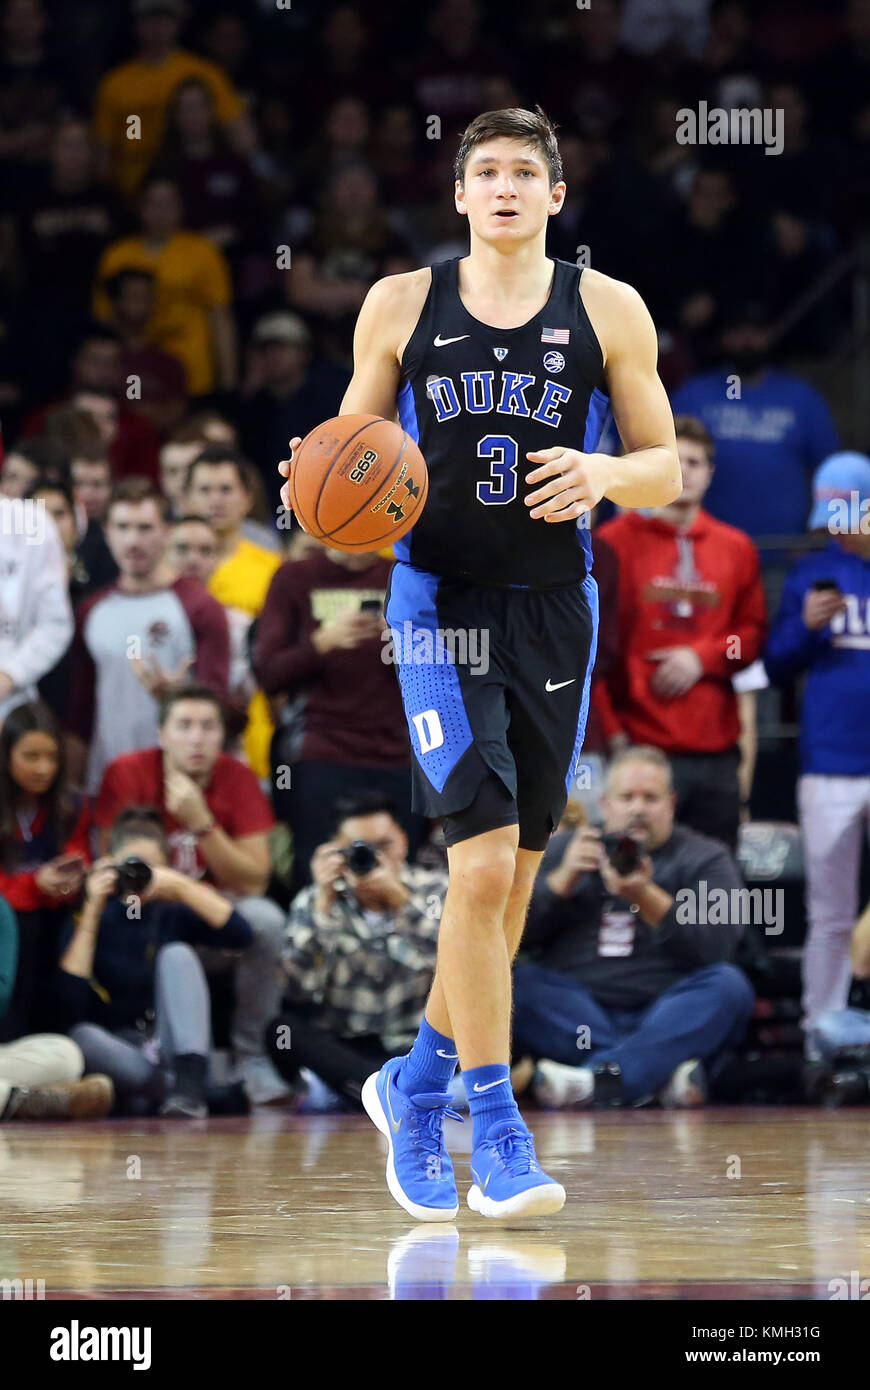 College Basketball Duke Stock Photos & College Basketball Duke Stock Images - Alamy